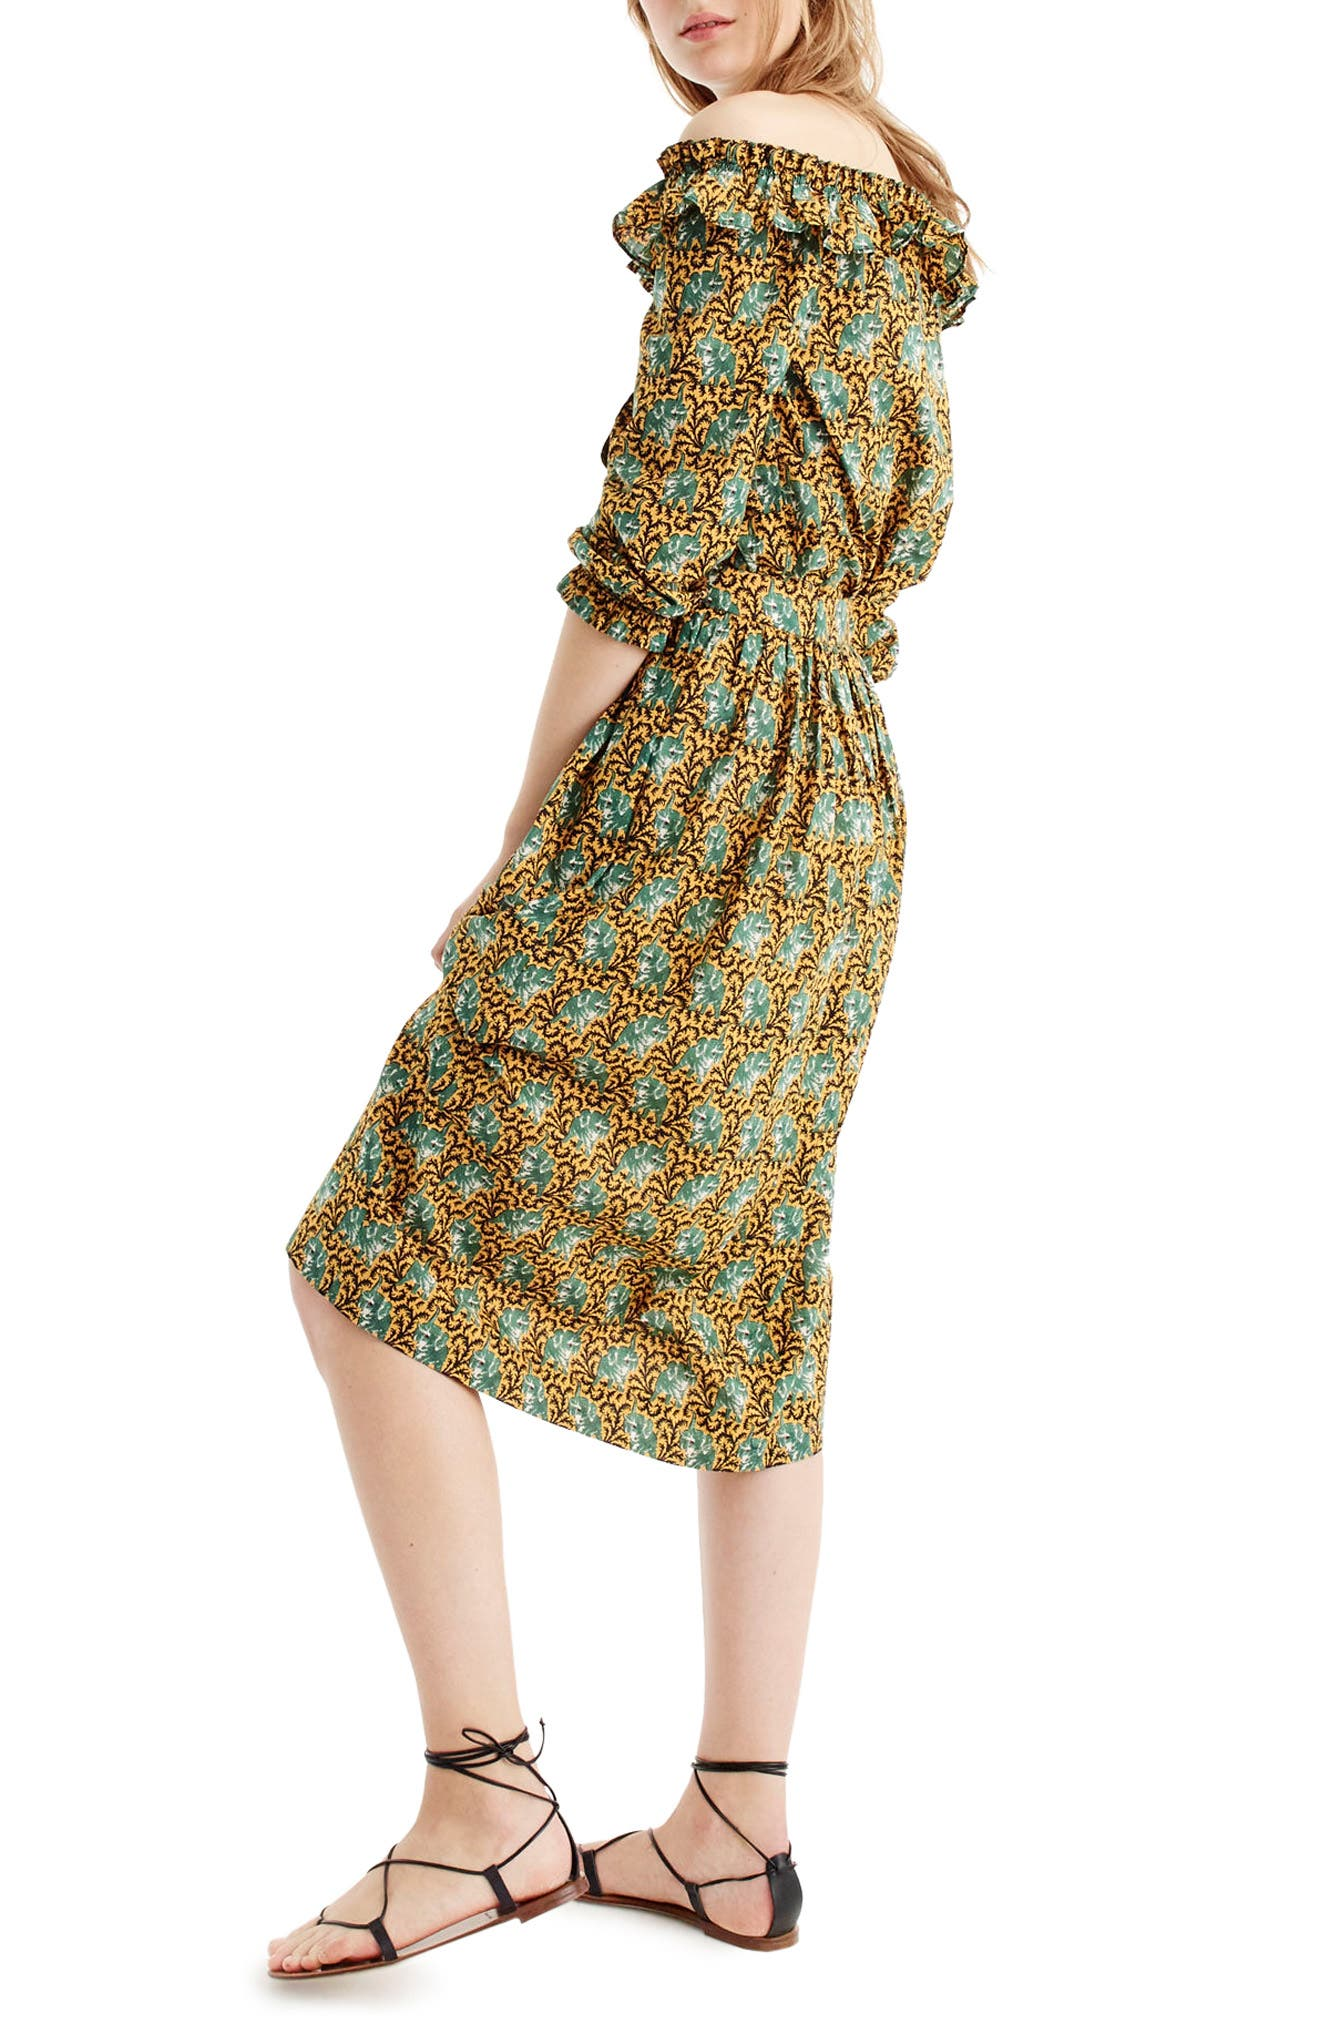 Elephant Print Skirt,                             Alternate thumbnail 2, color,